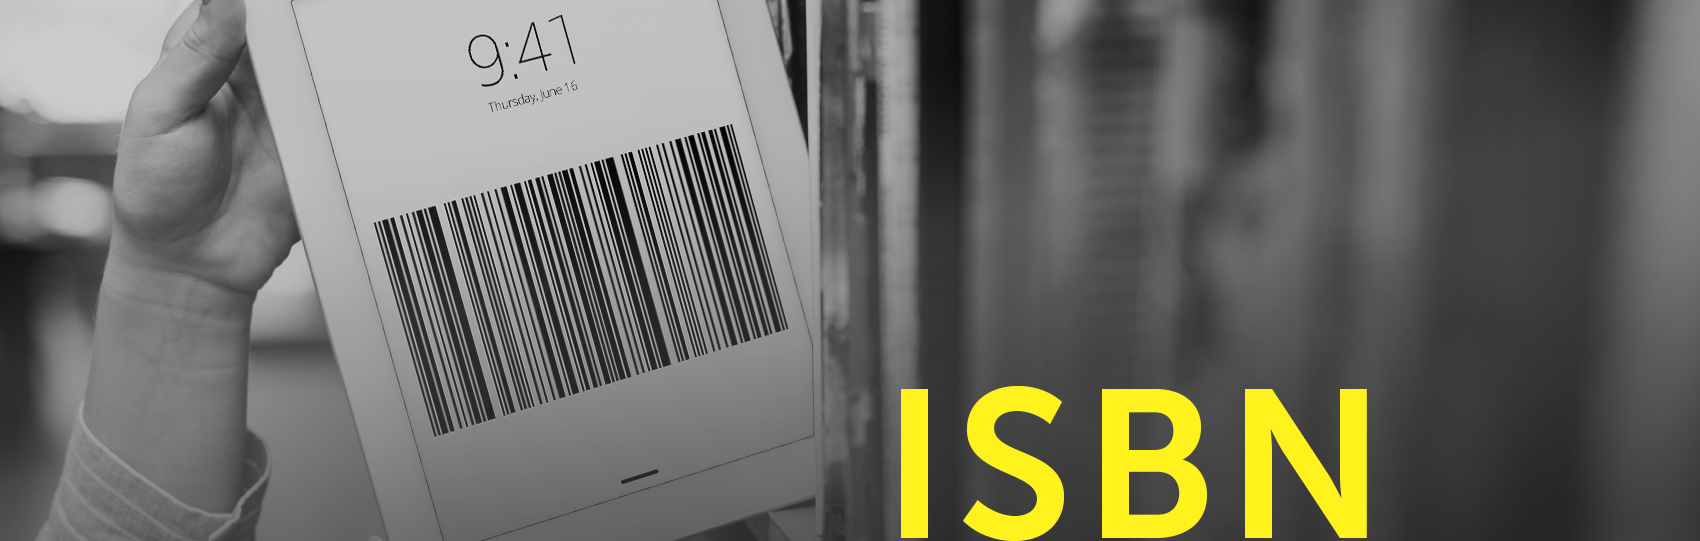 ISBN в електронних книгах